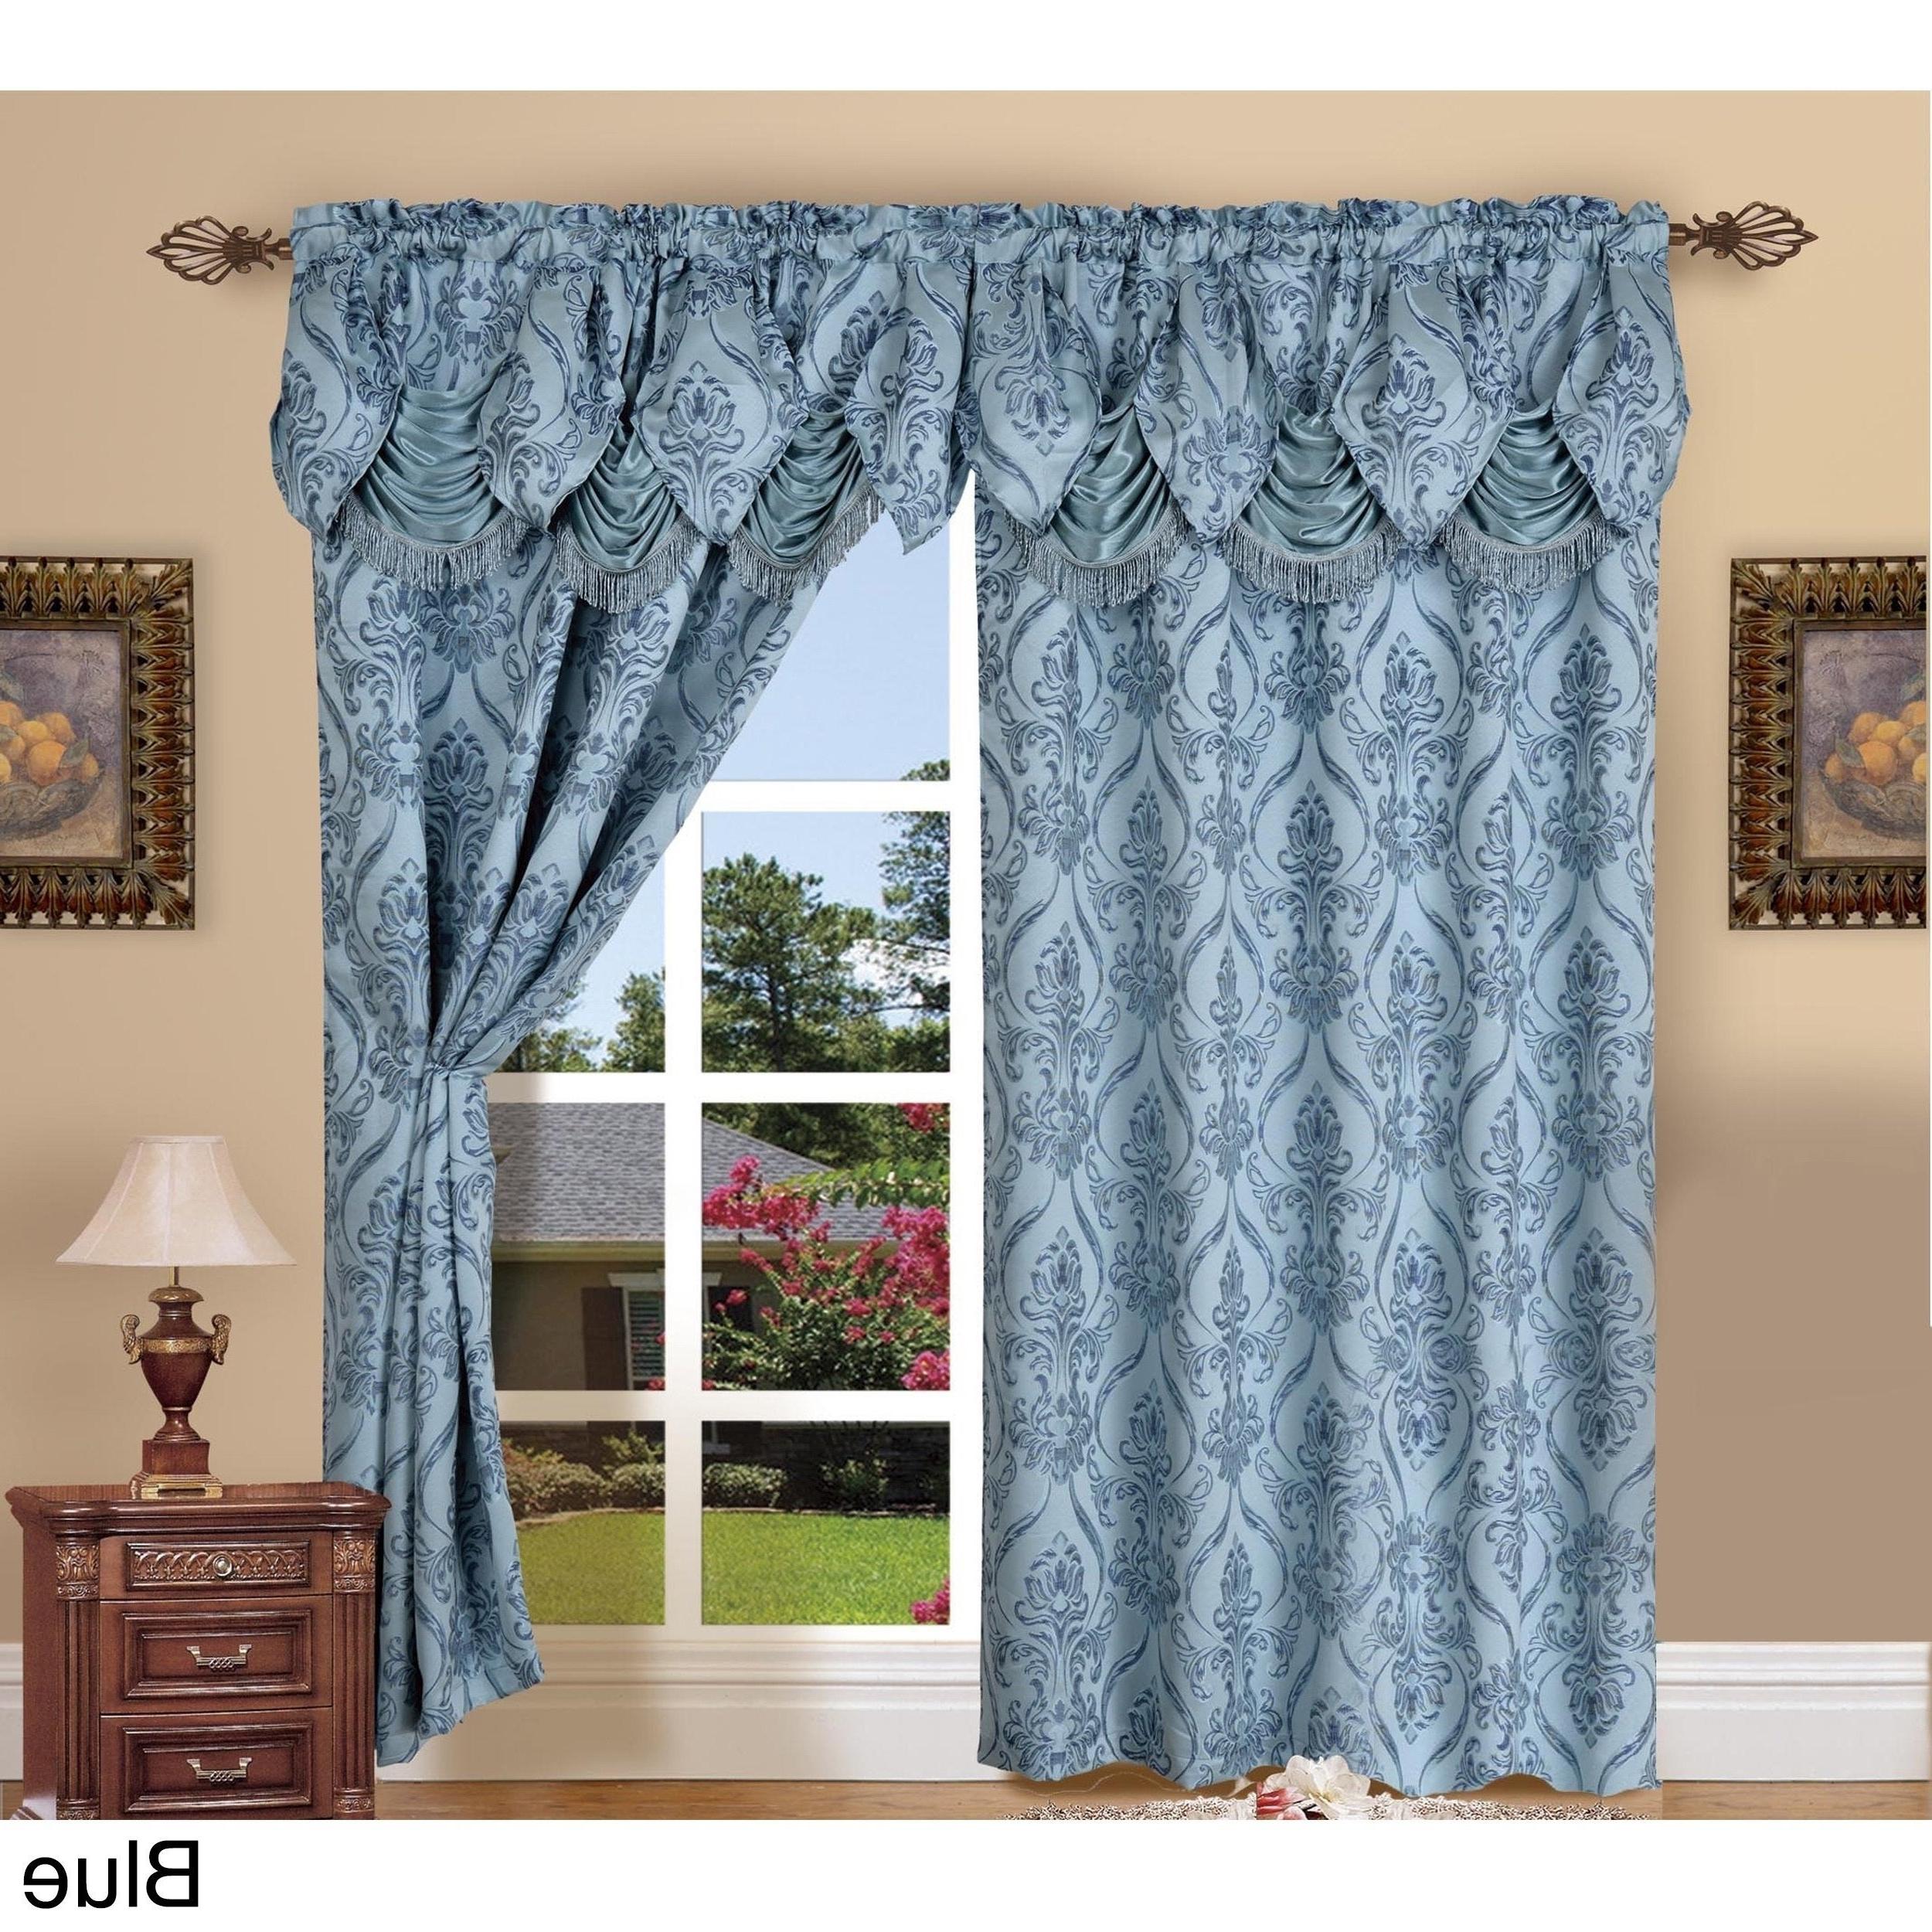 Elegant Comfort Luxury Penelopie Jacquard Window Curtain Panel Pairs Regarding Most Popular Elegant Comfort Luxury Penelopie Jacquard 84 Inch Length Window Curtain Panel Pair (View 3 of 20)